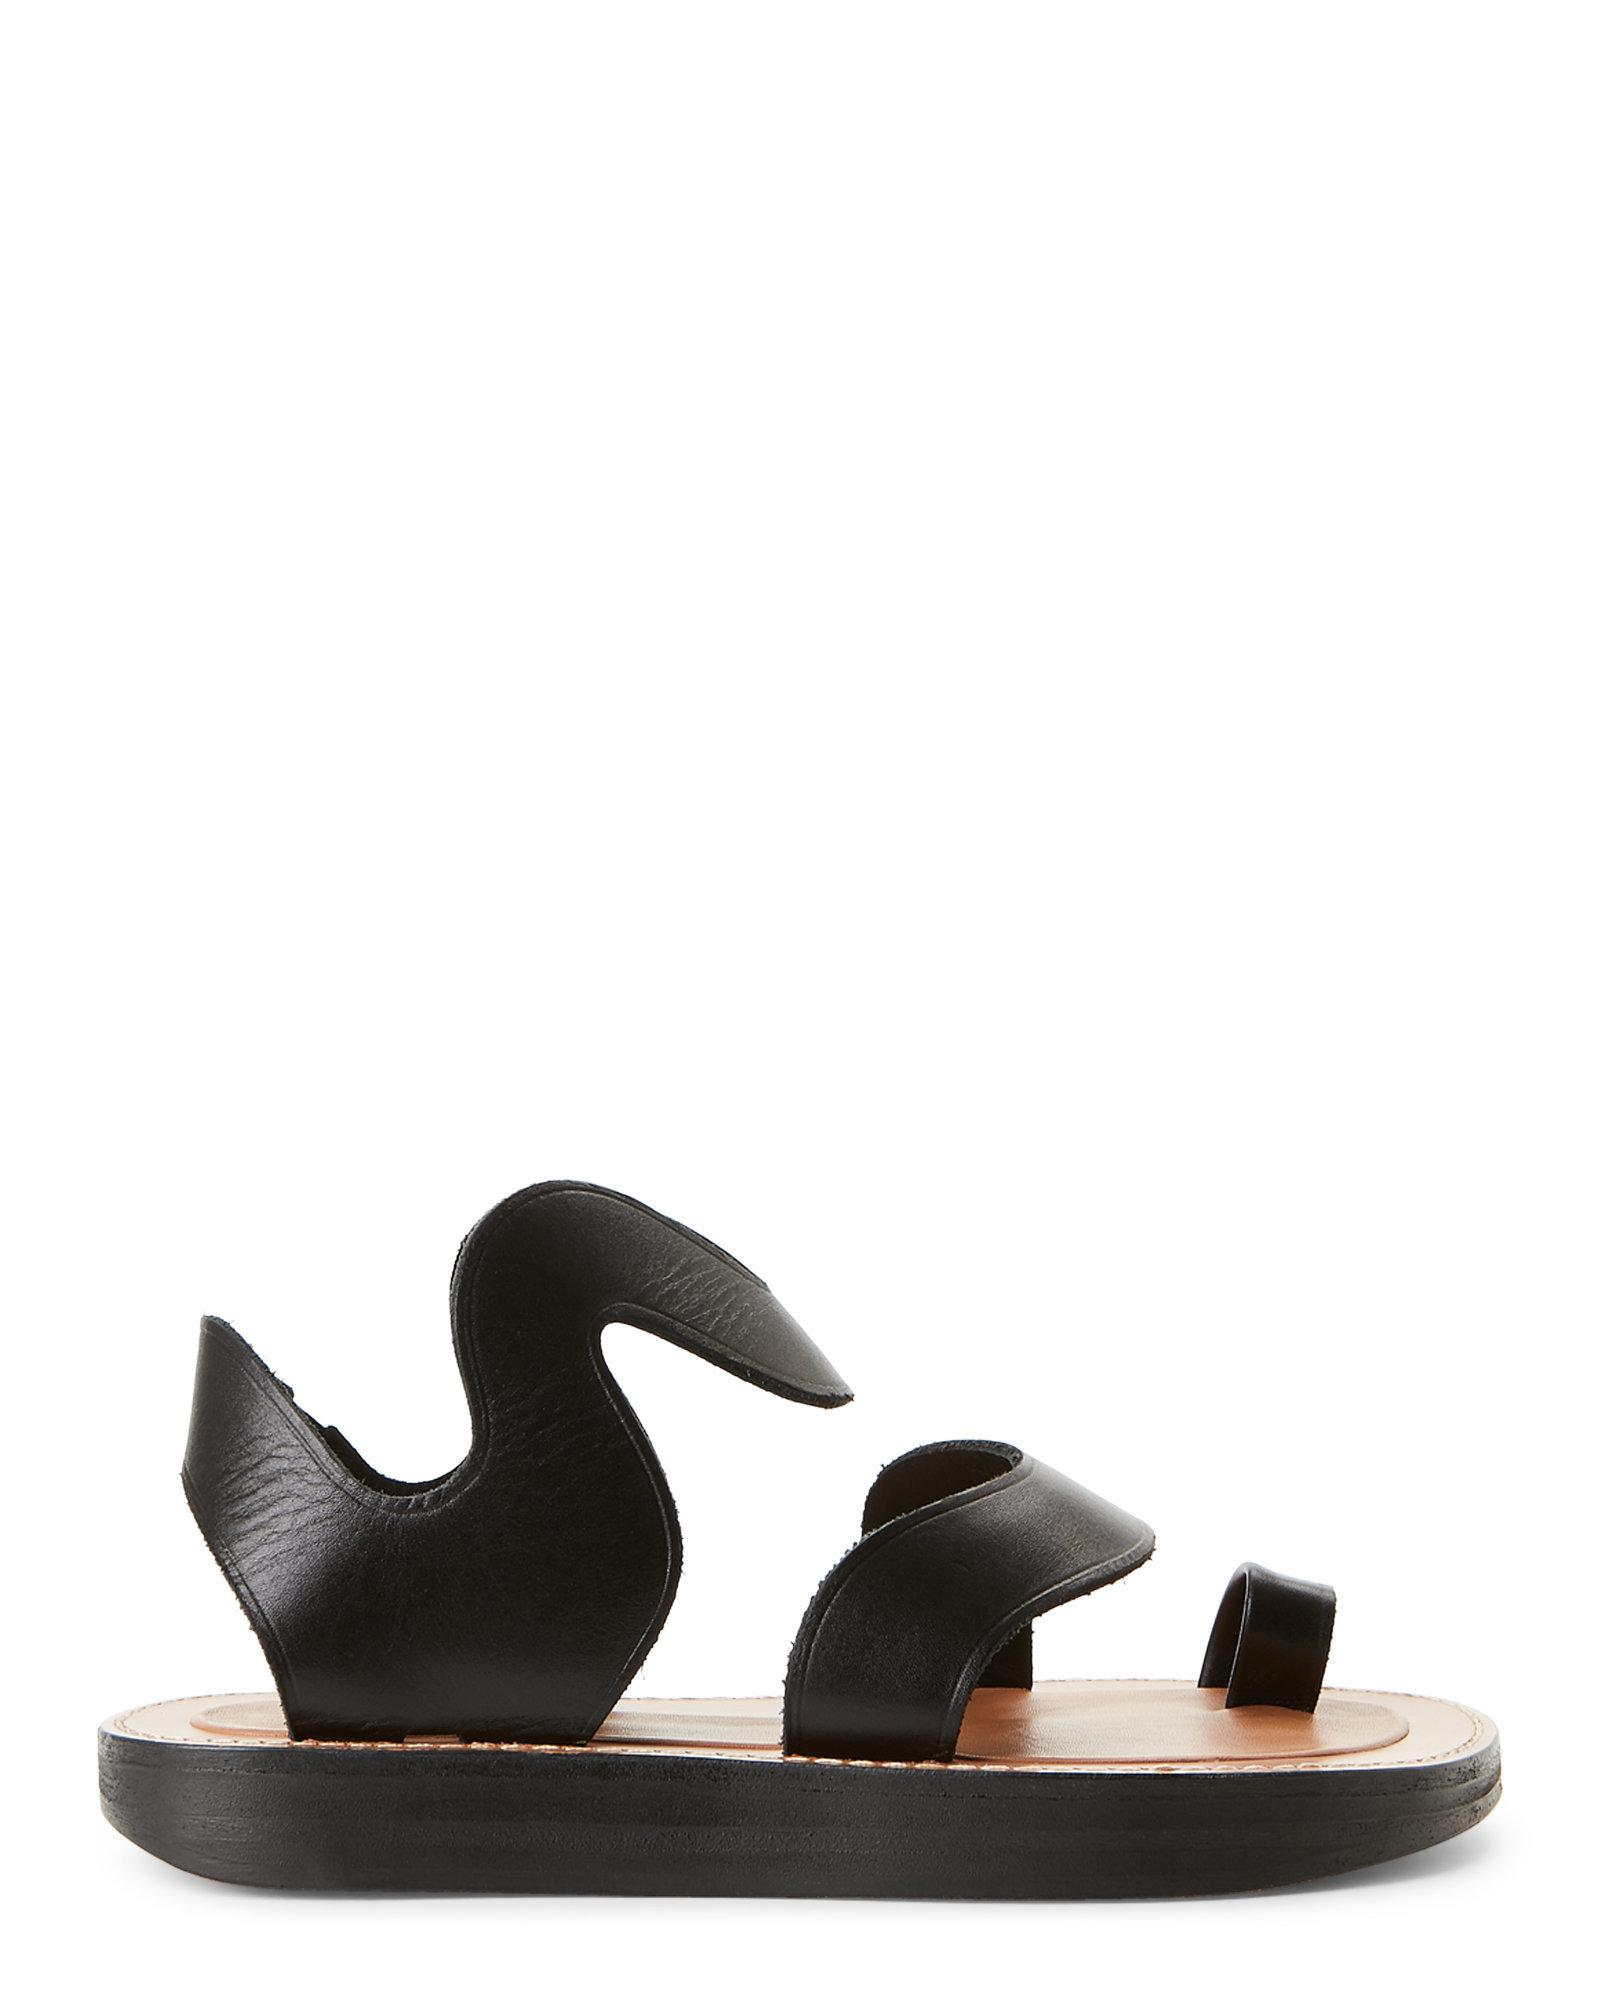 79cdaea162db97 Lyst - Céline Black Wave-Strap Toe Ring Flat Sandals in Black